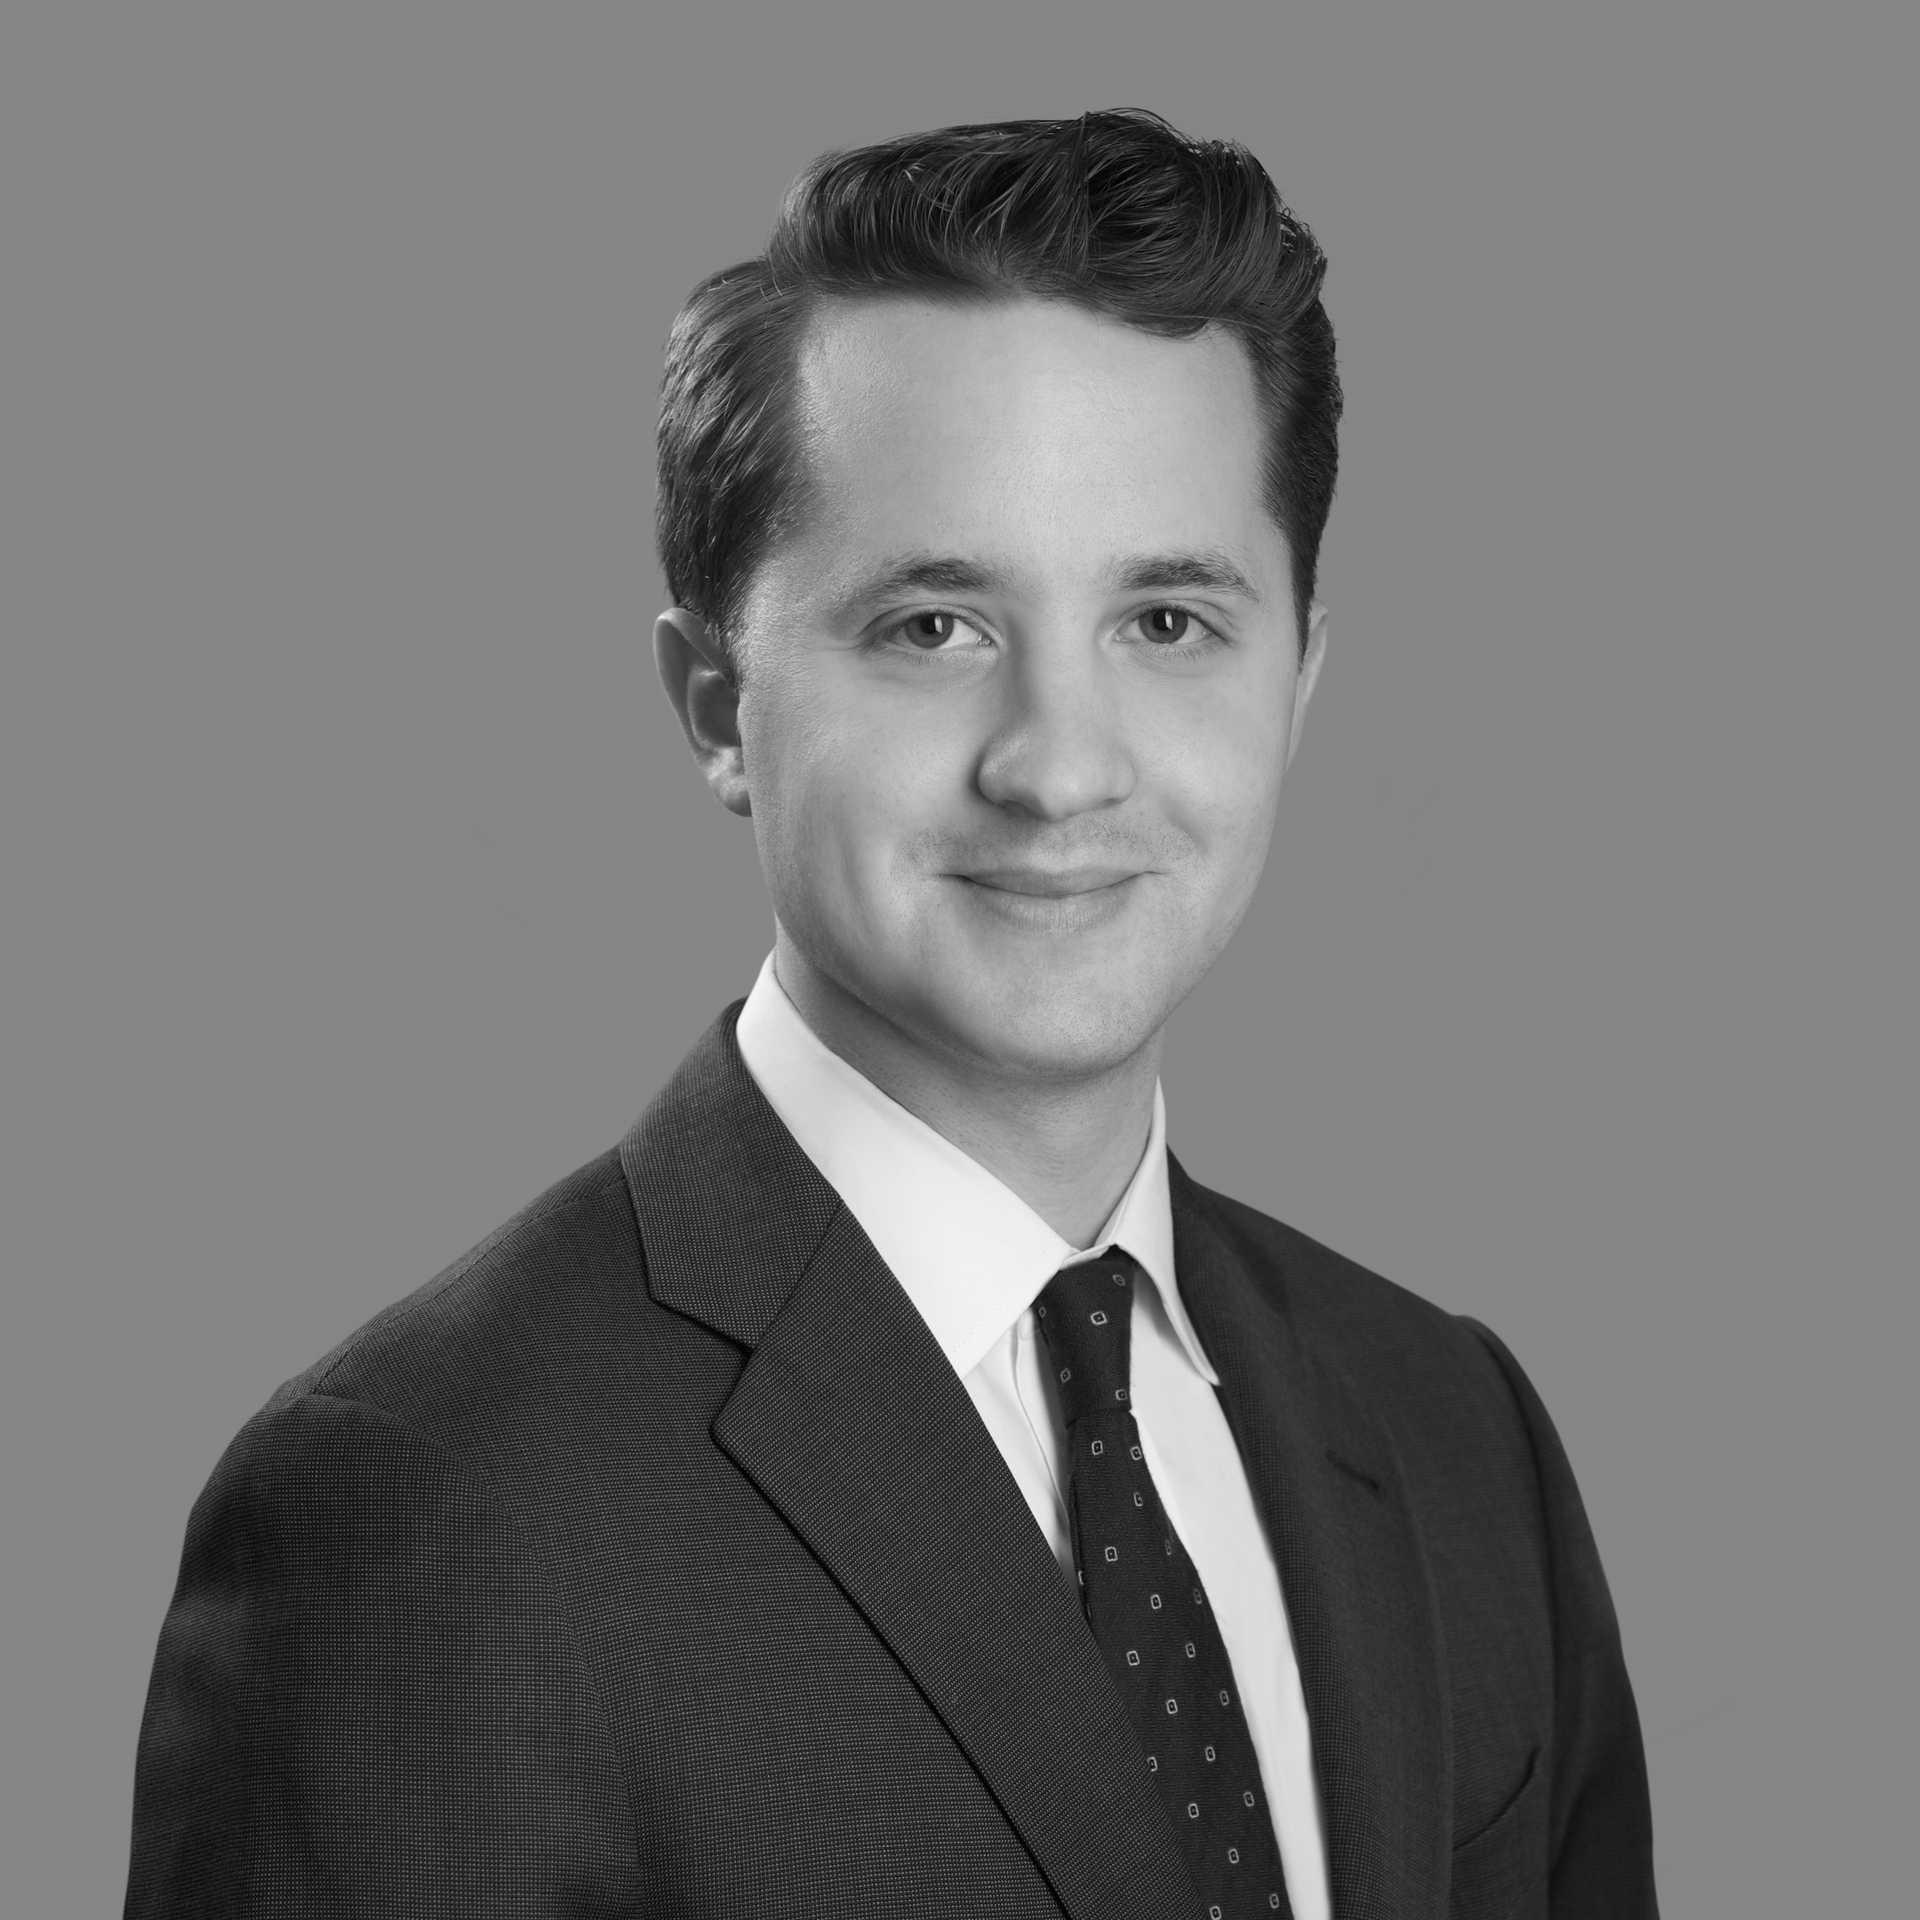 Marlin Hawk New York's Consultant Max Mettelman